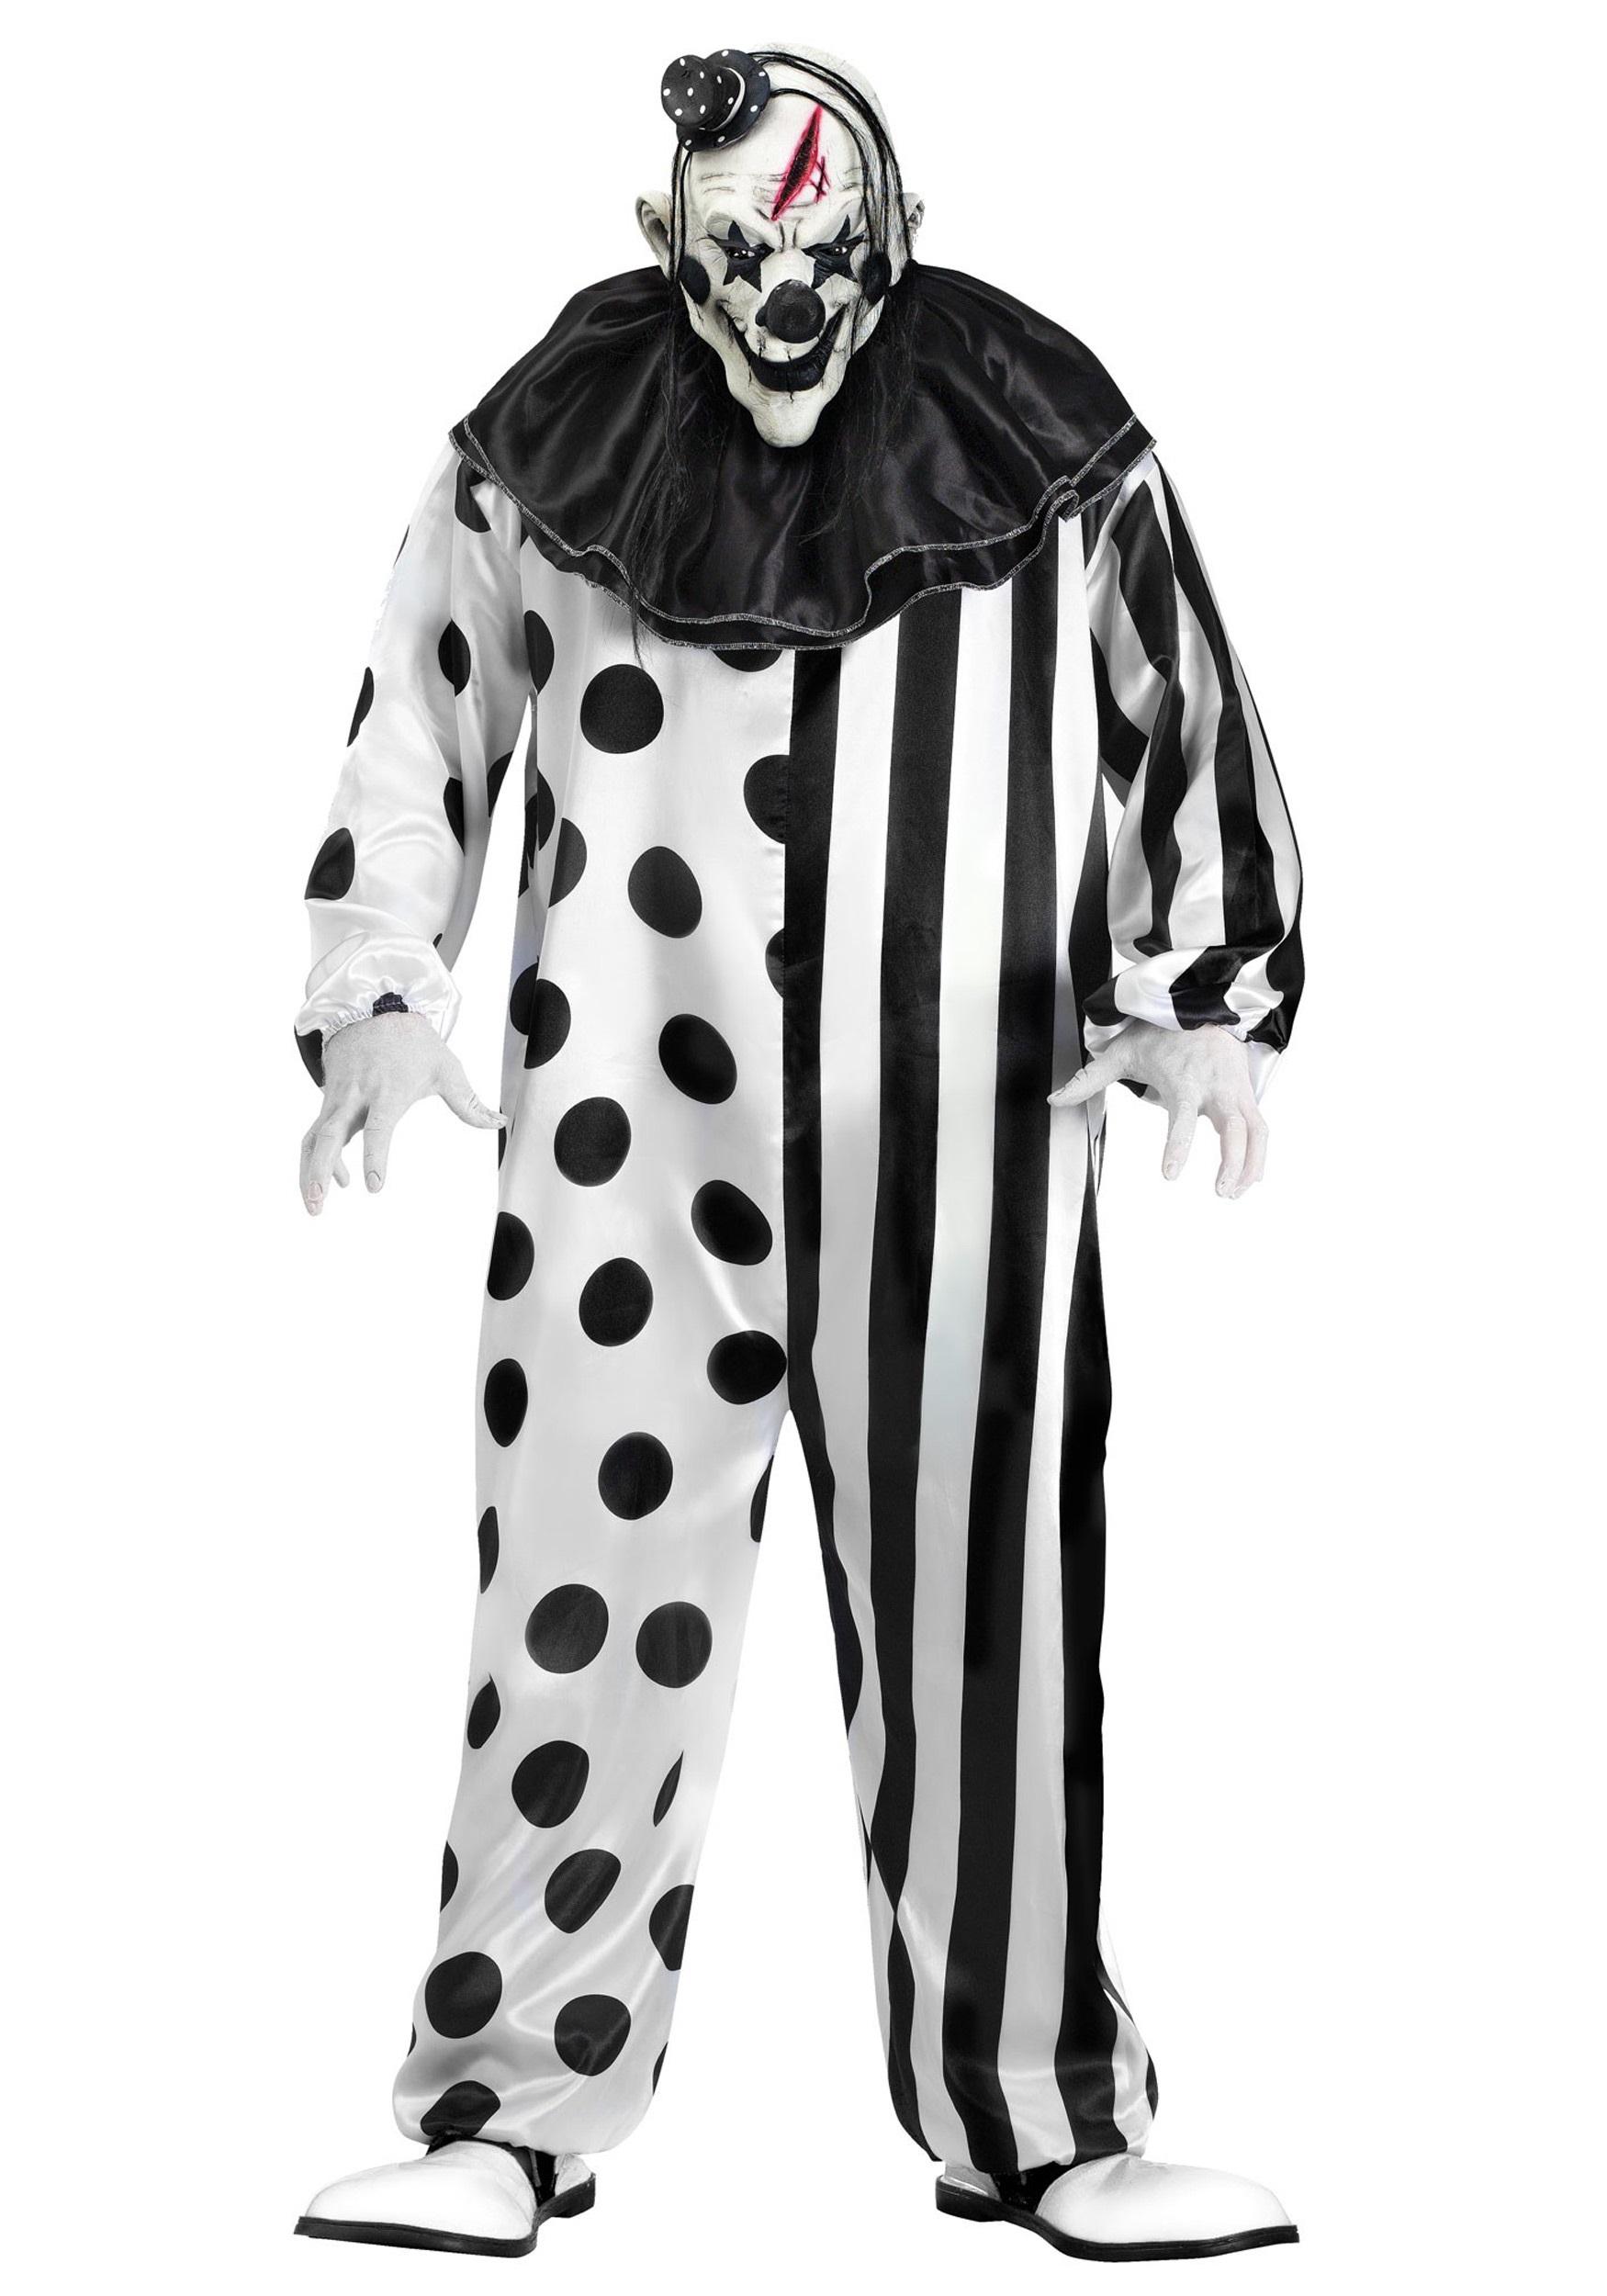 Mens Ladies SCARY JESTER CLOWN COSTUME Halloween Killer Couple Fancy Dress UK